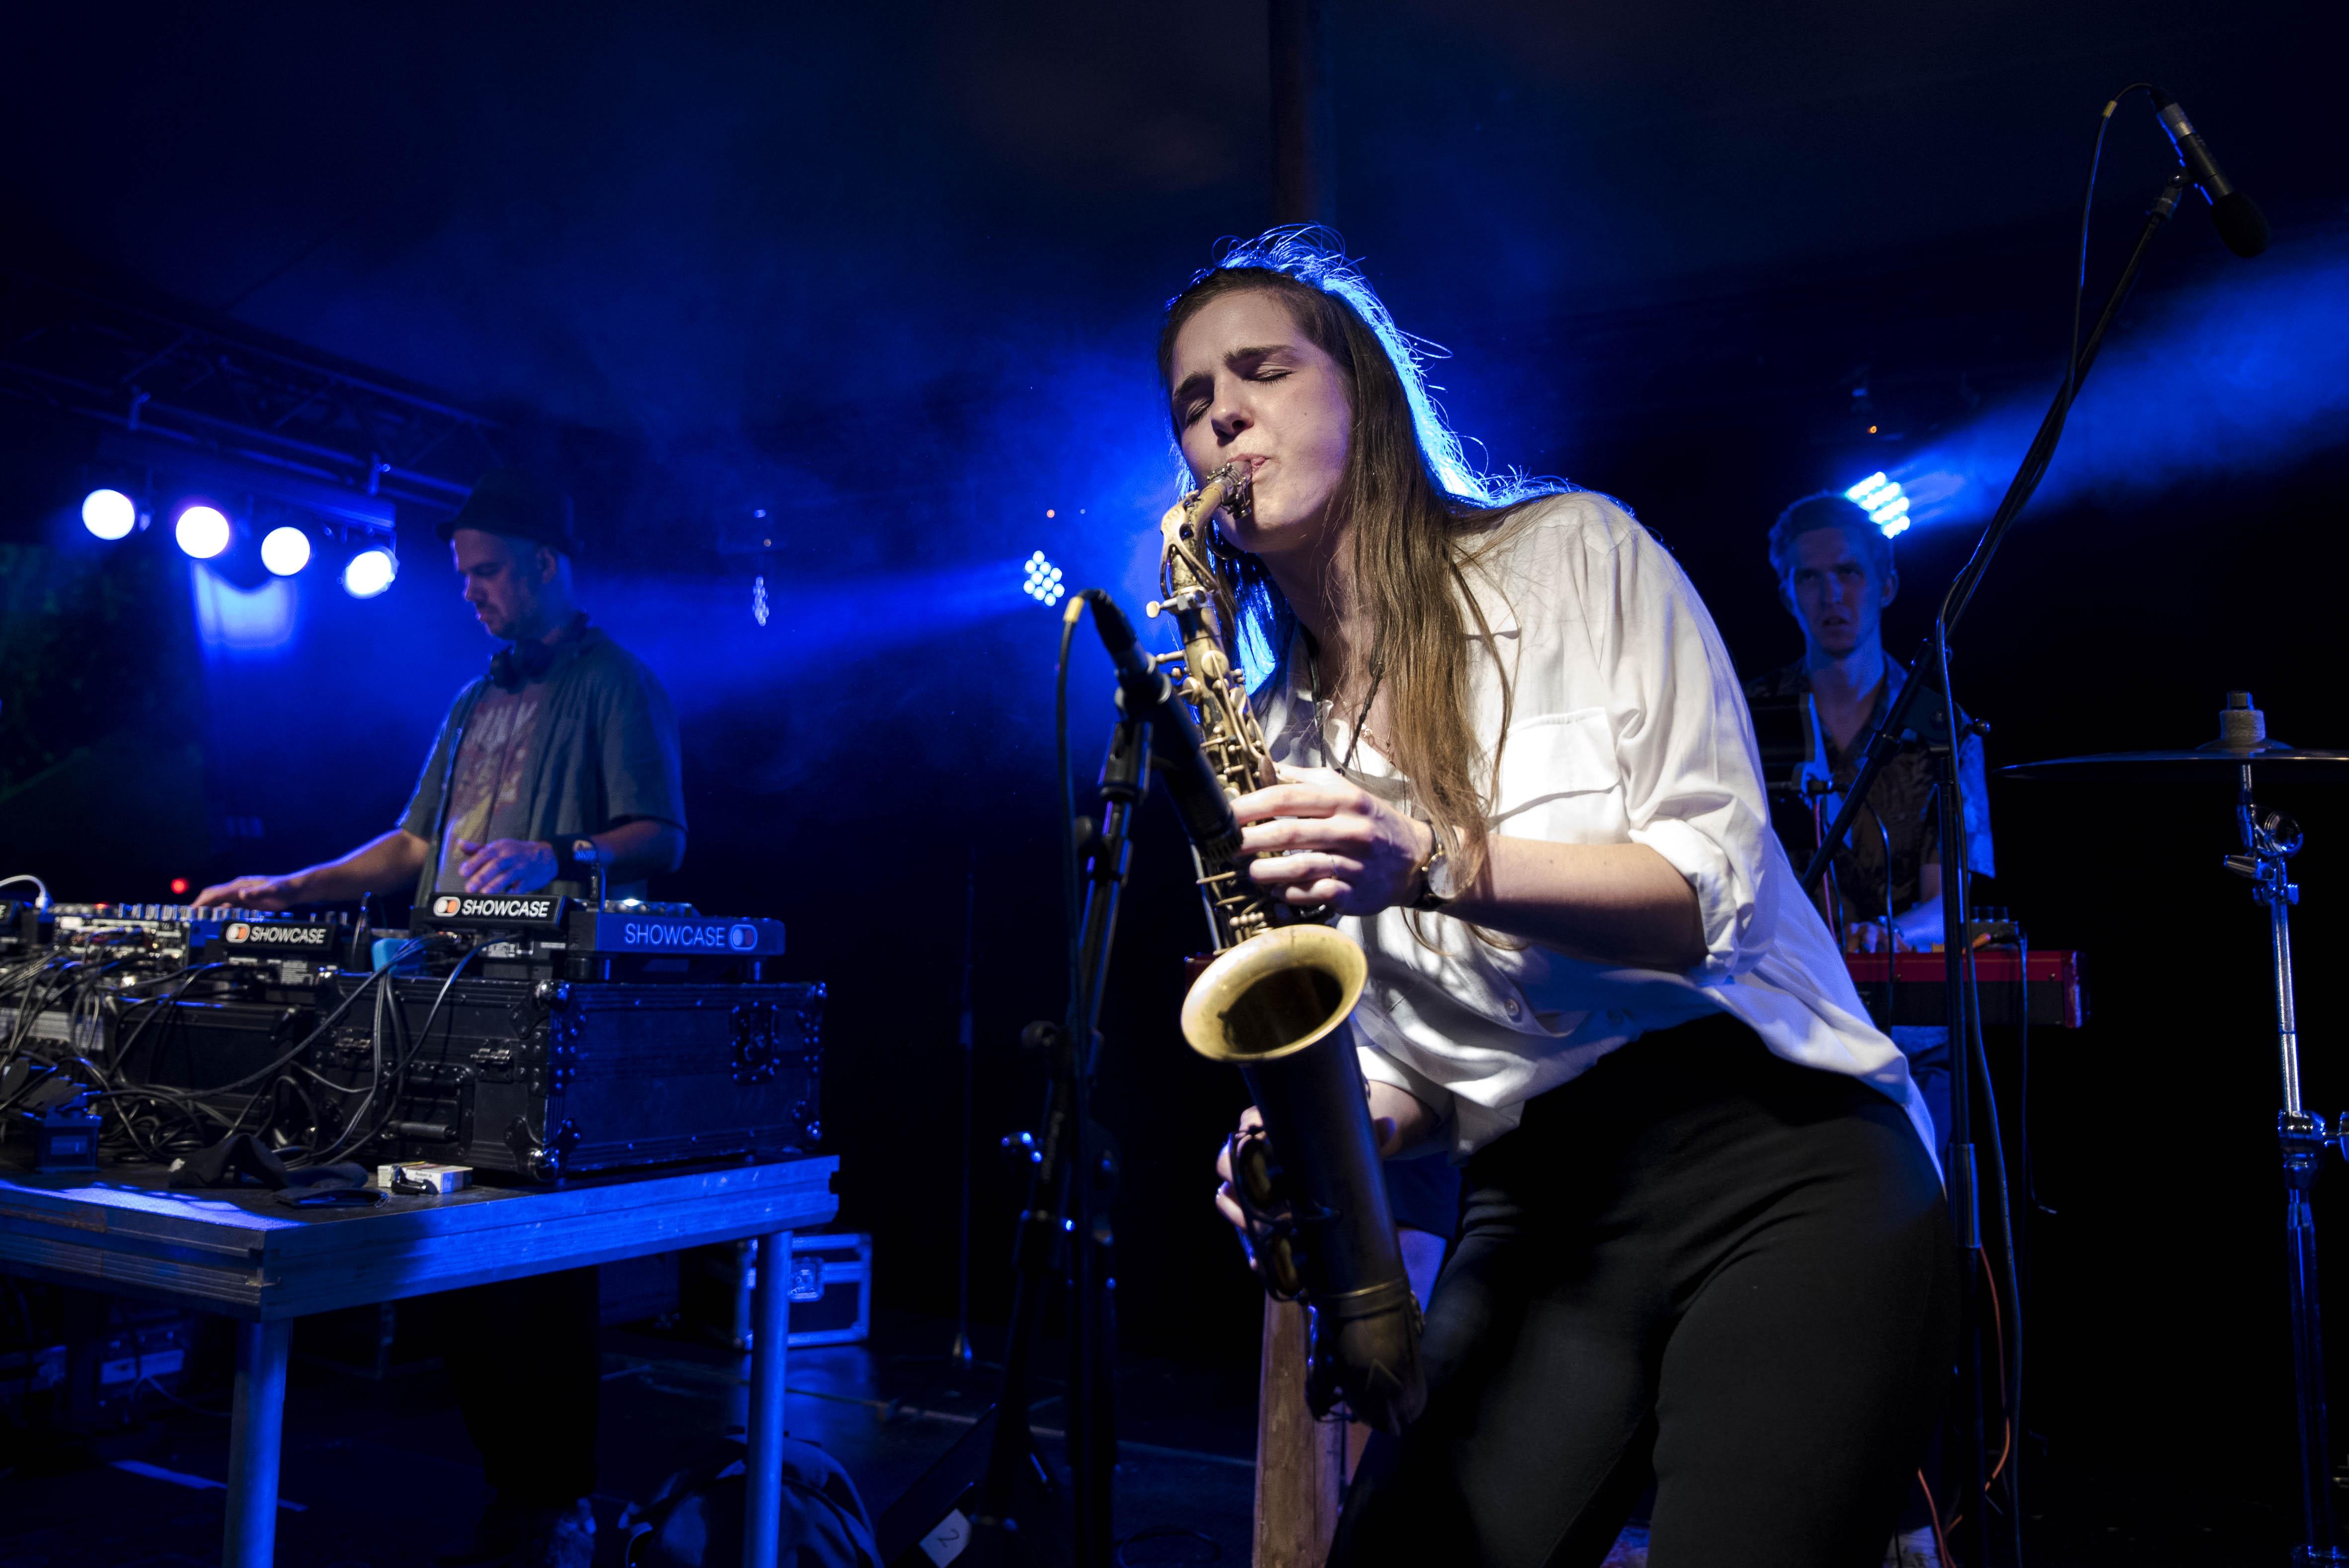 Otis x Brebl // Wicked Jazz Sounds x Kika Sprangers x Daniël van der Duim